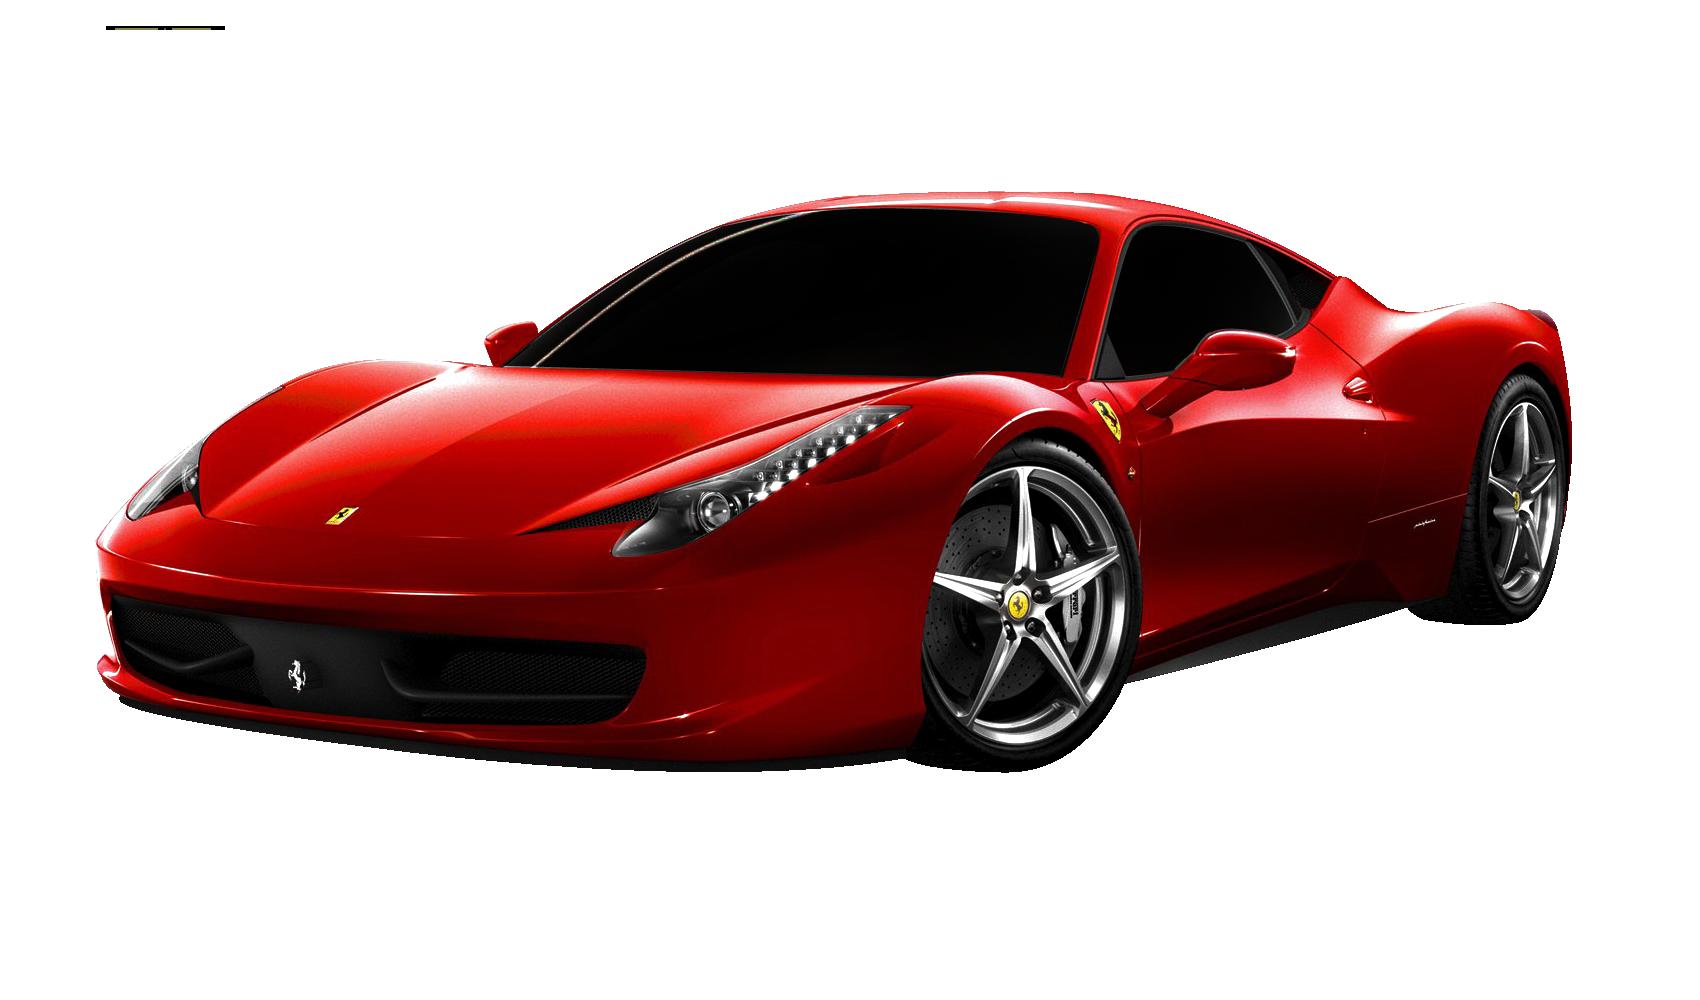 Free Ferrari Cliparts, Download Free Clip Art, Free Clip Art on.